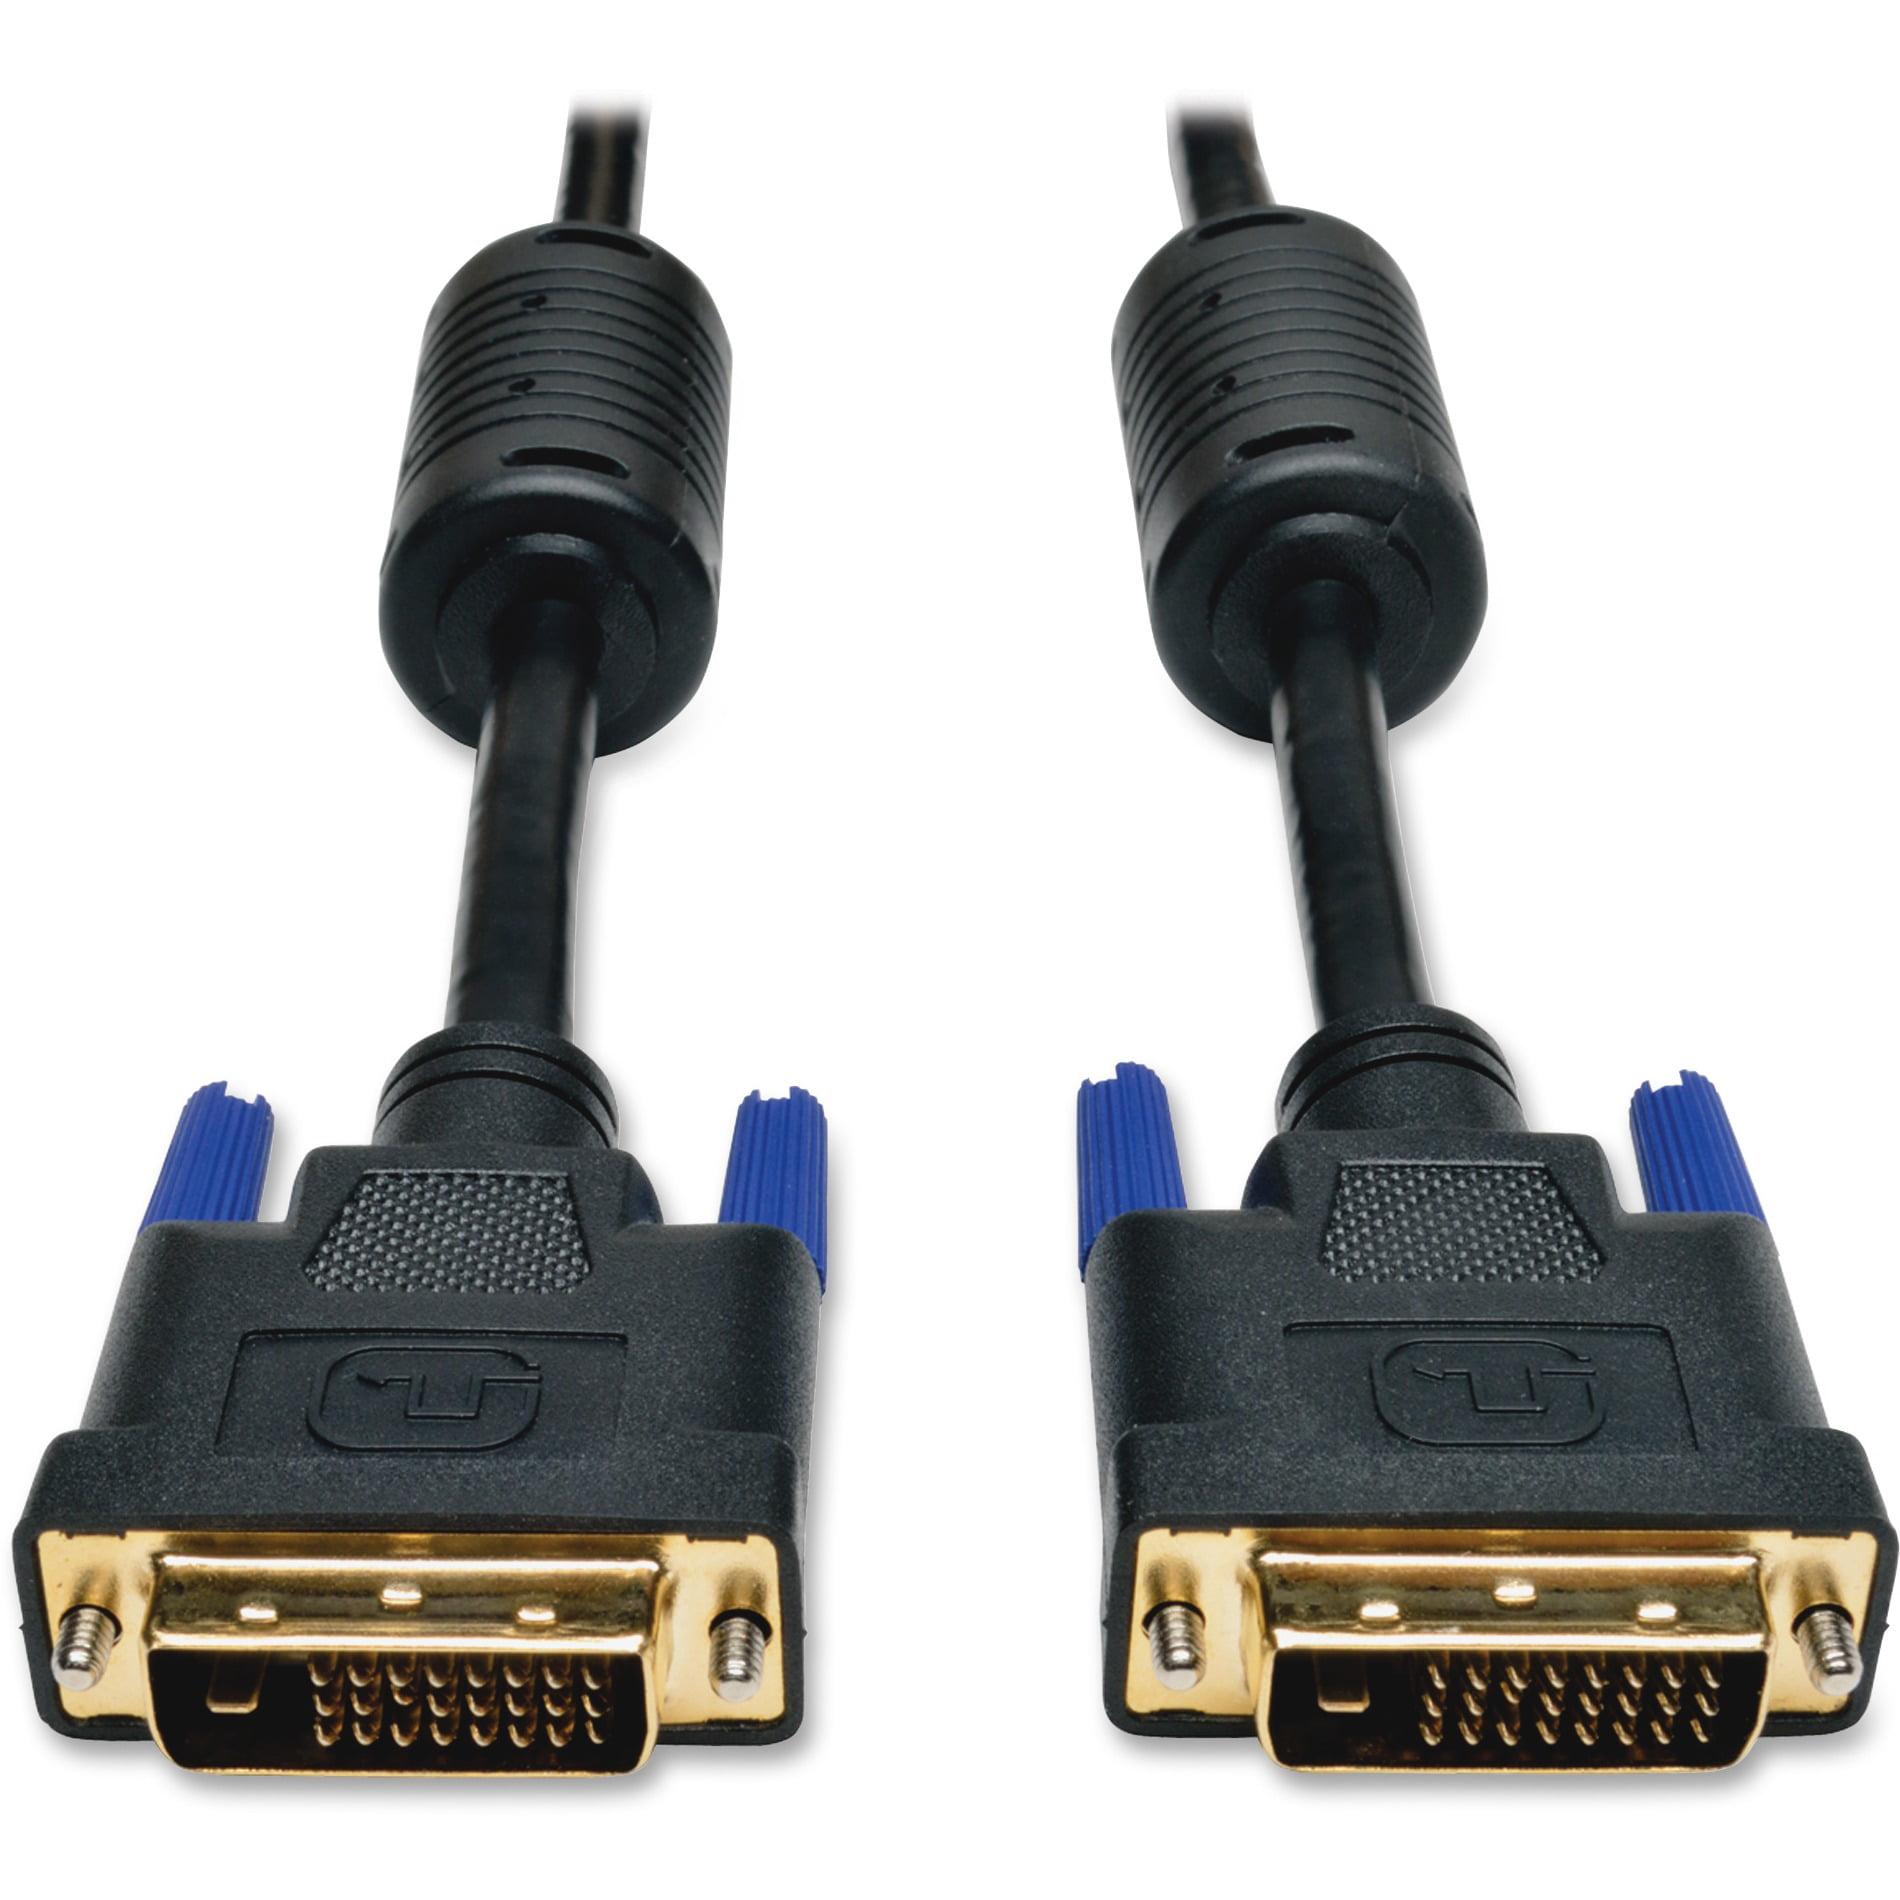 Tripp Lite, TRPP560006, DVI Dual Link Cable, 1, Black